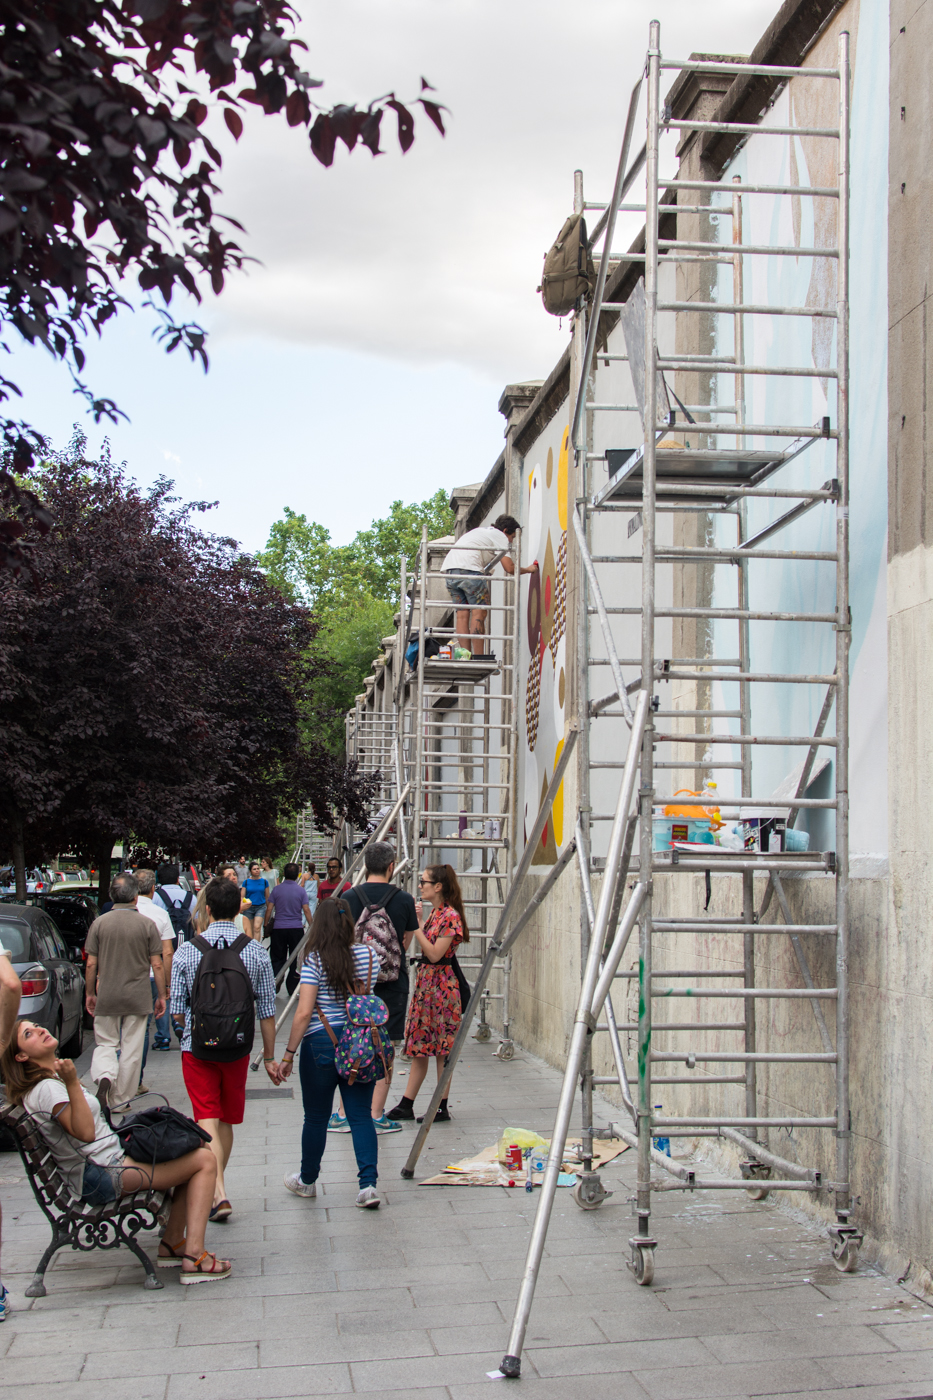 muros2016_golahundun_lelo_ambiente 14-06-2016 20-27-47.jpg